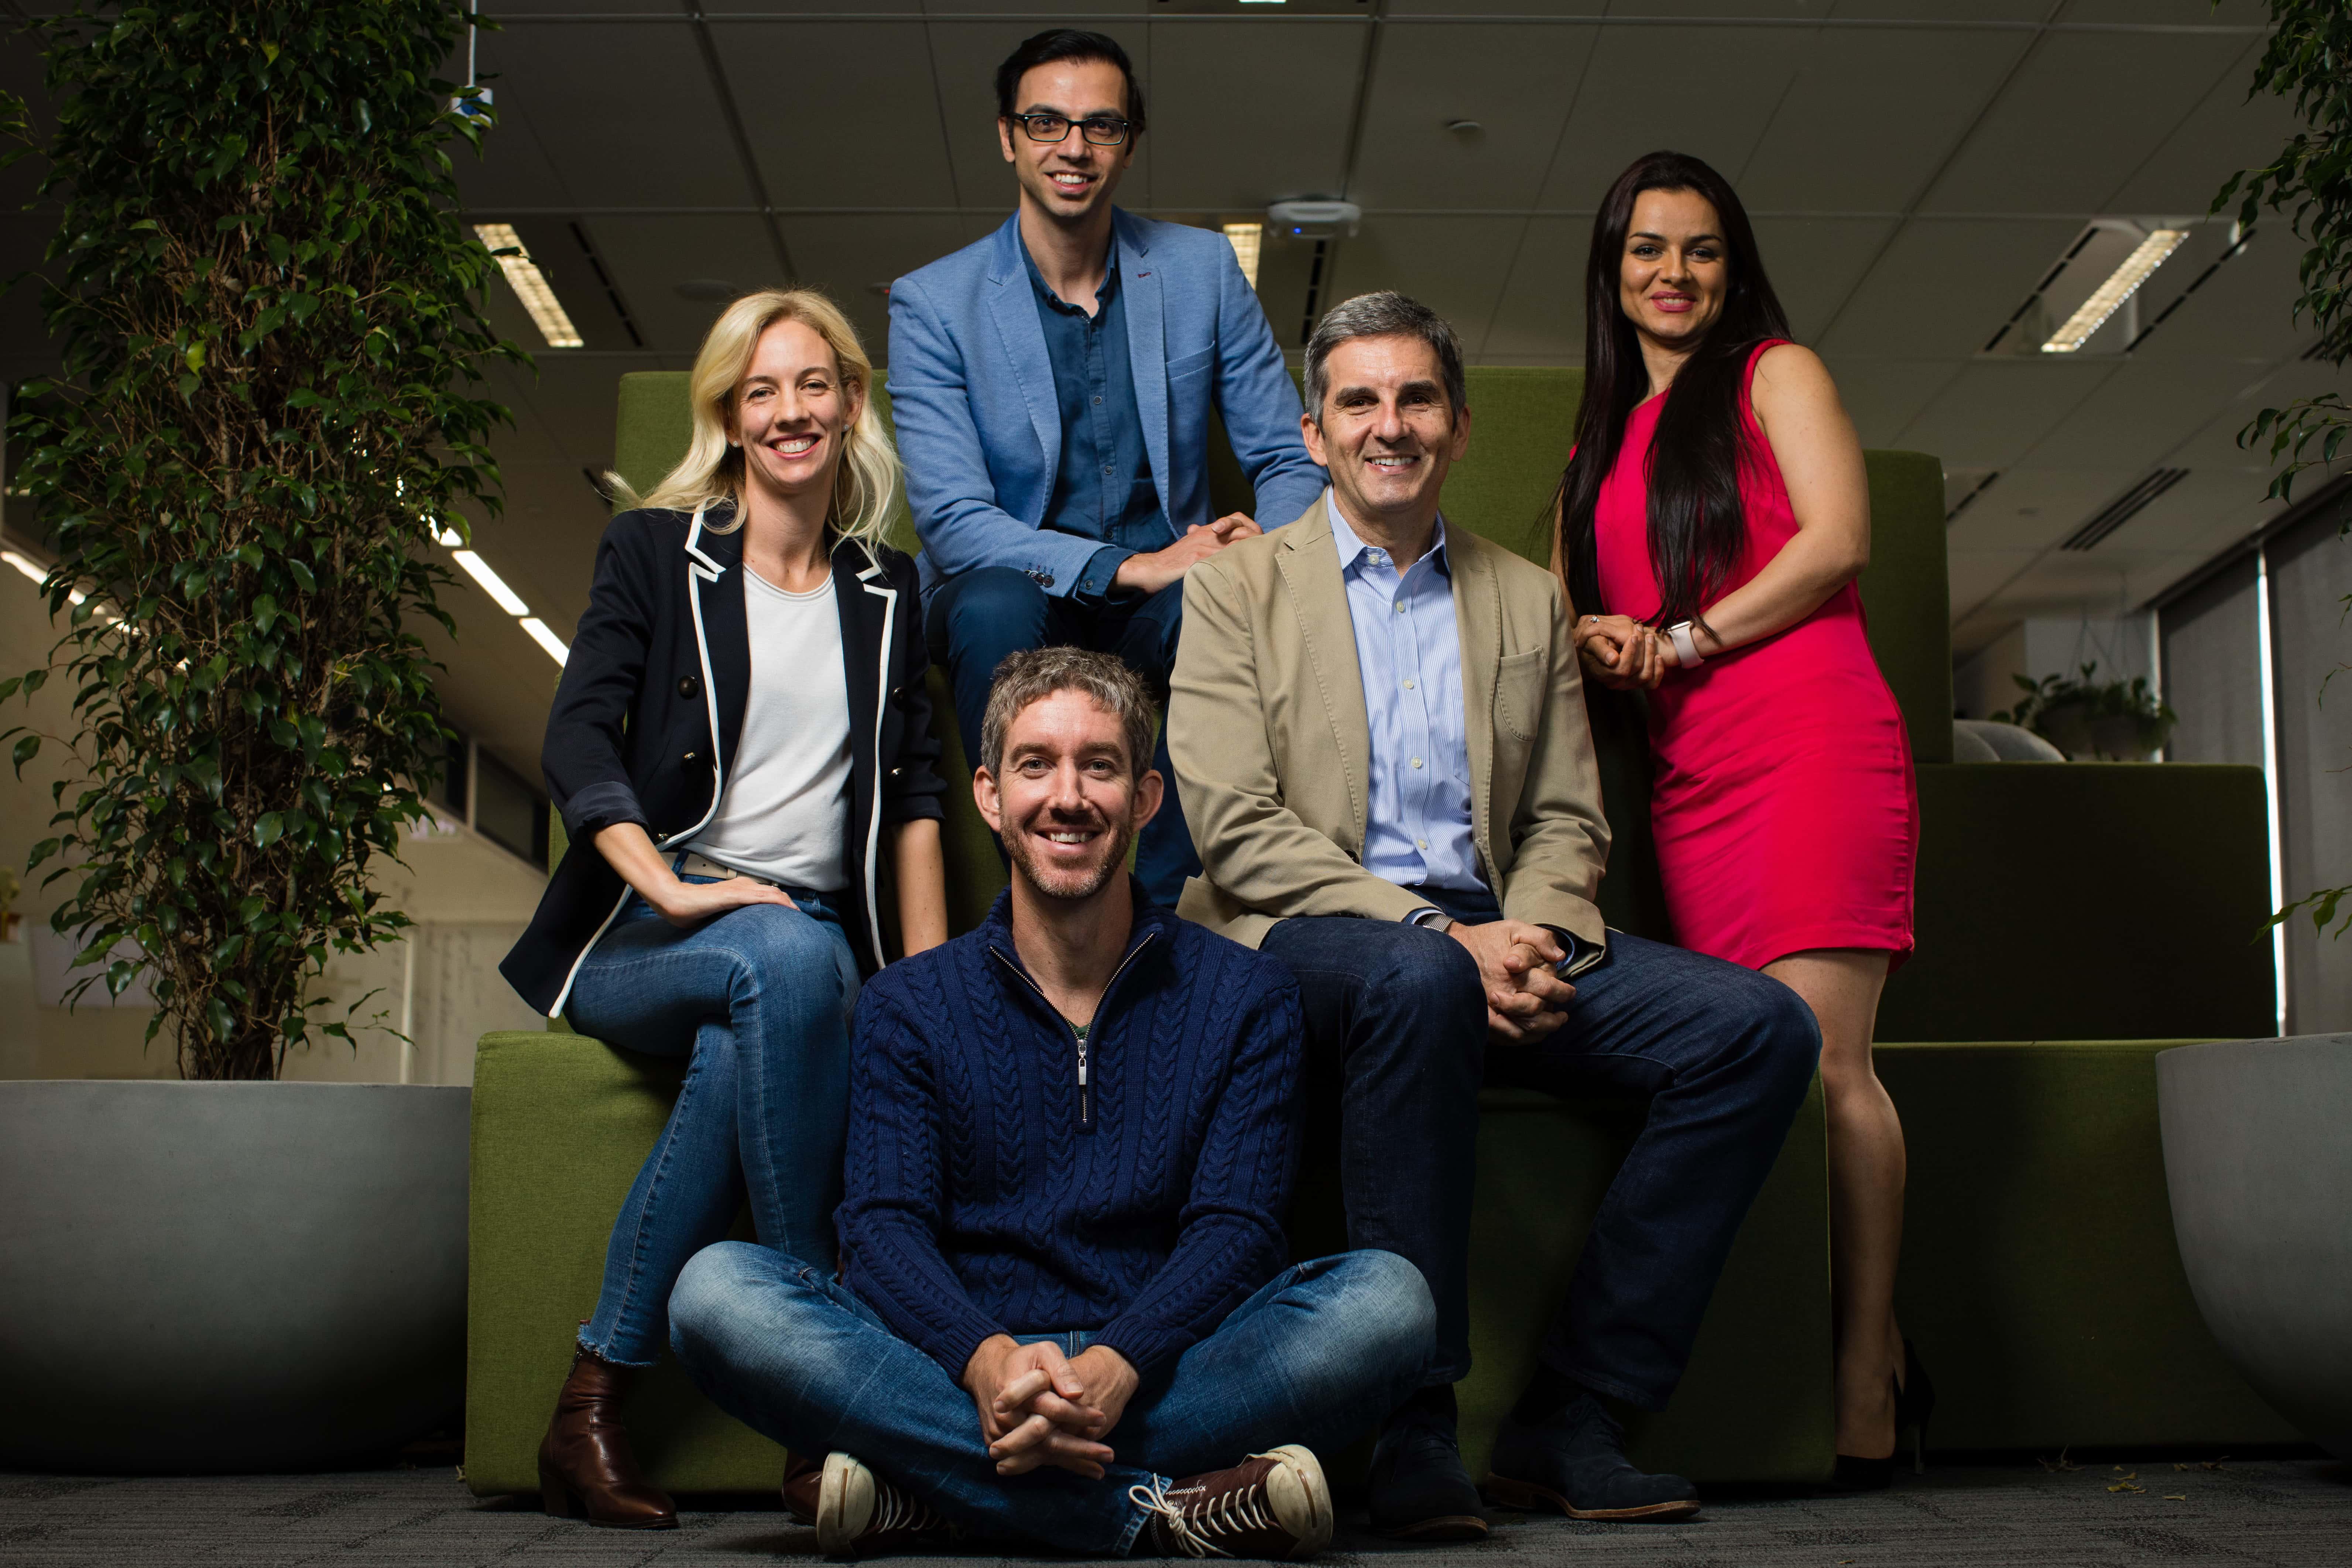 Maryam Sadeghi, Majid Razmara MetaOptima, AirTree Ventures, Skip Capital